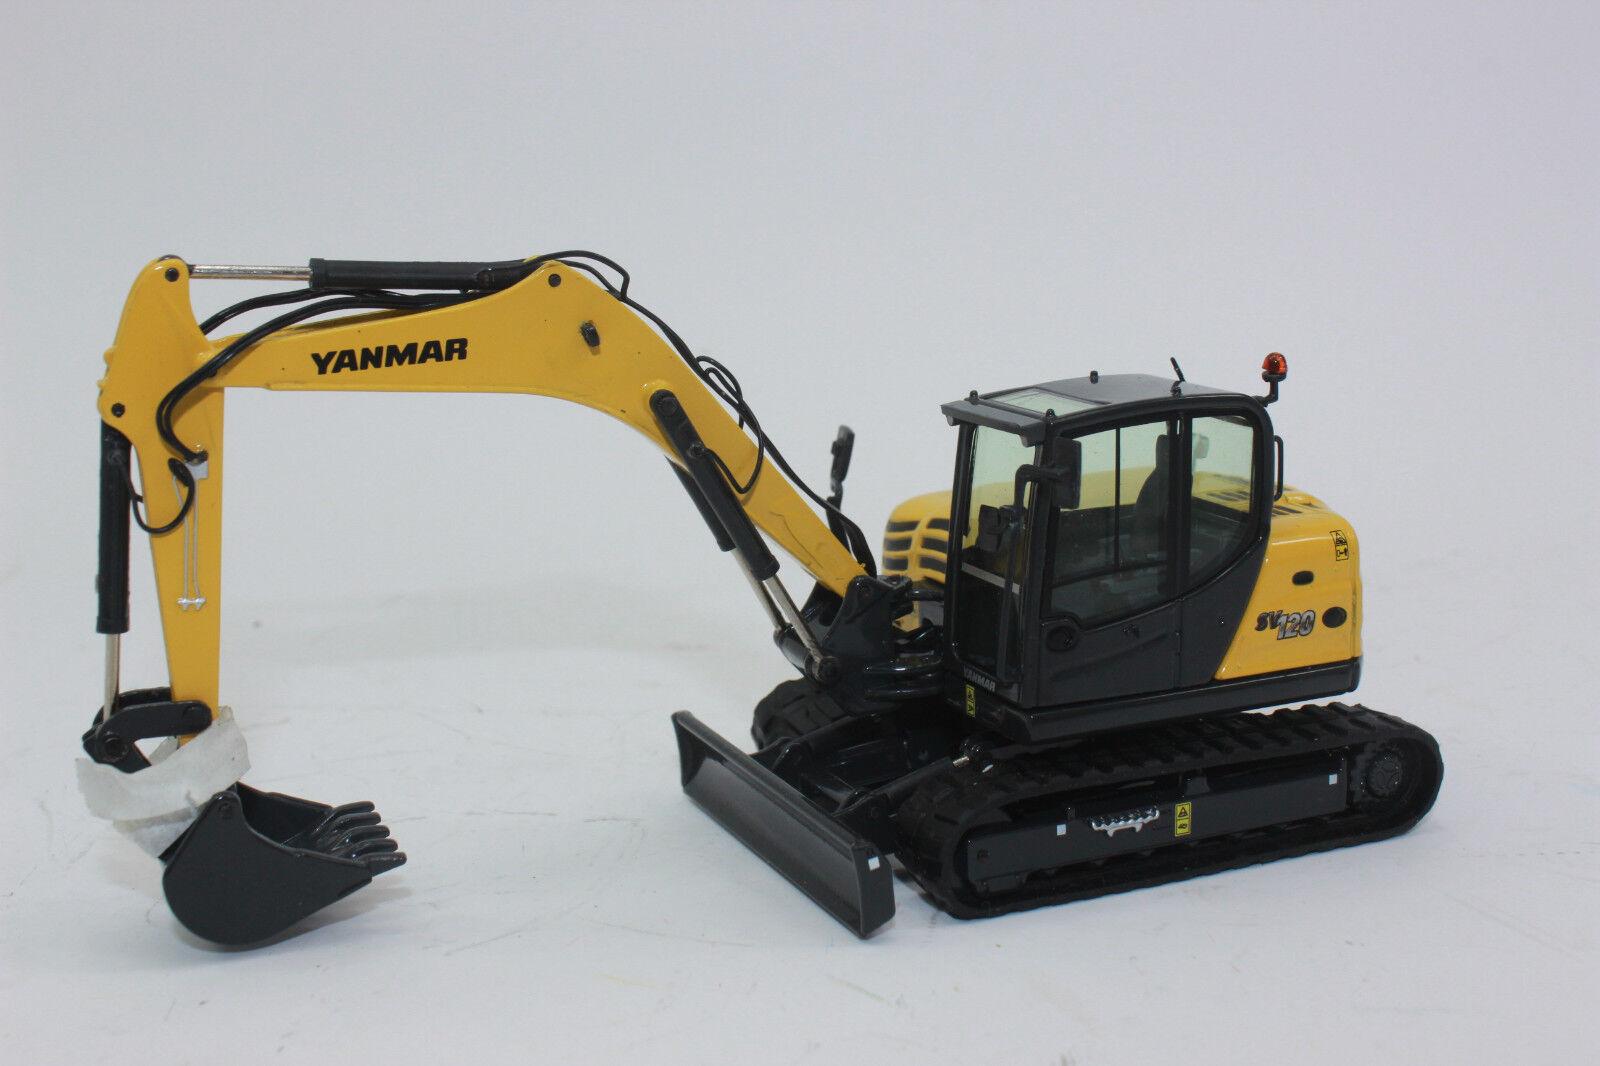 Nzg 975 Yanmar Sv120 Crawler Excavator 1 50 New Boxed